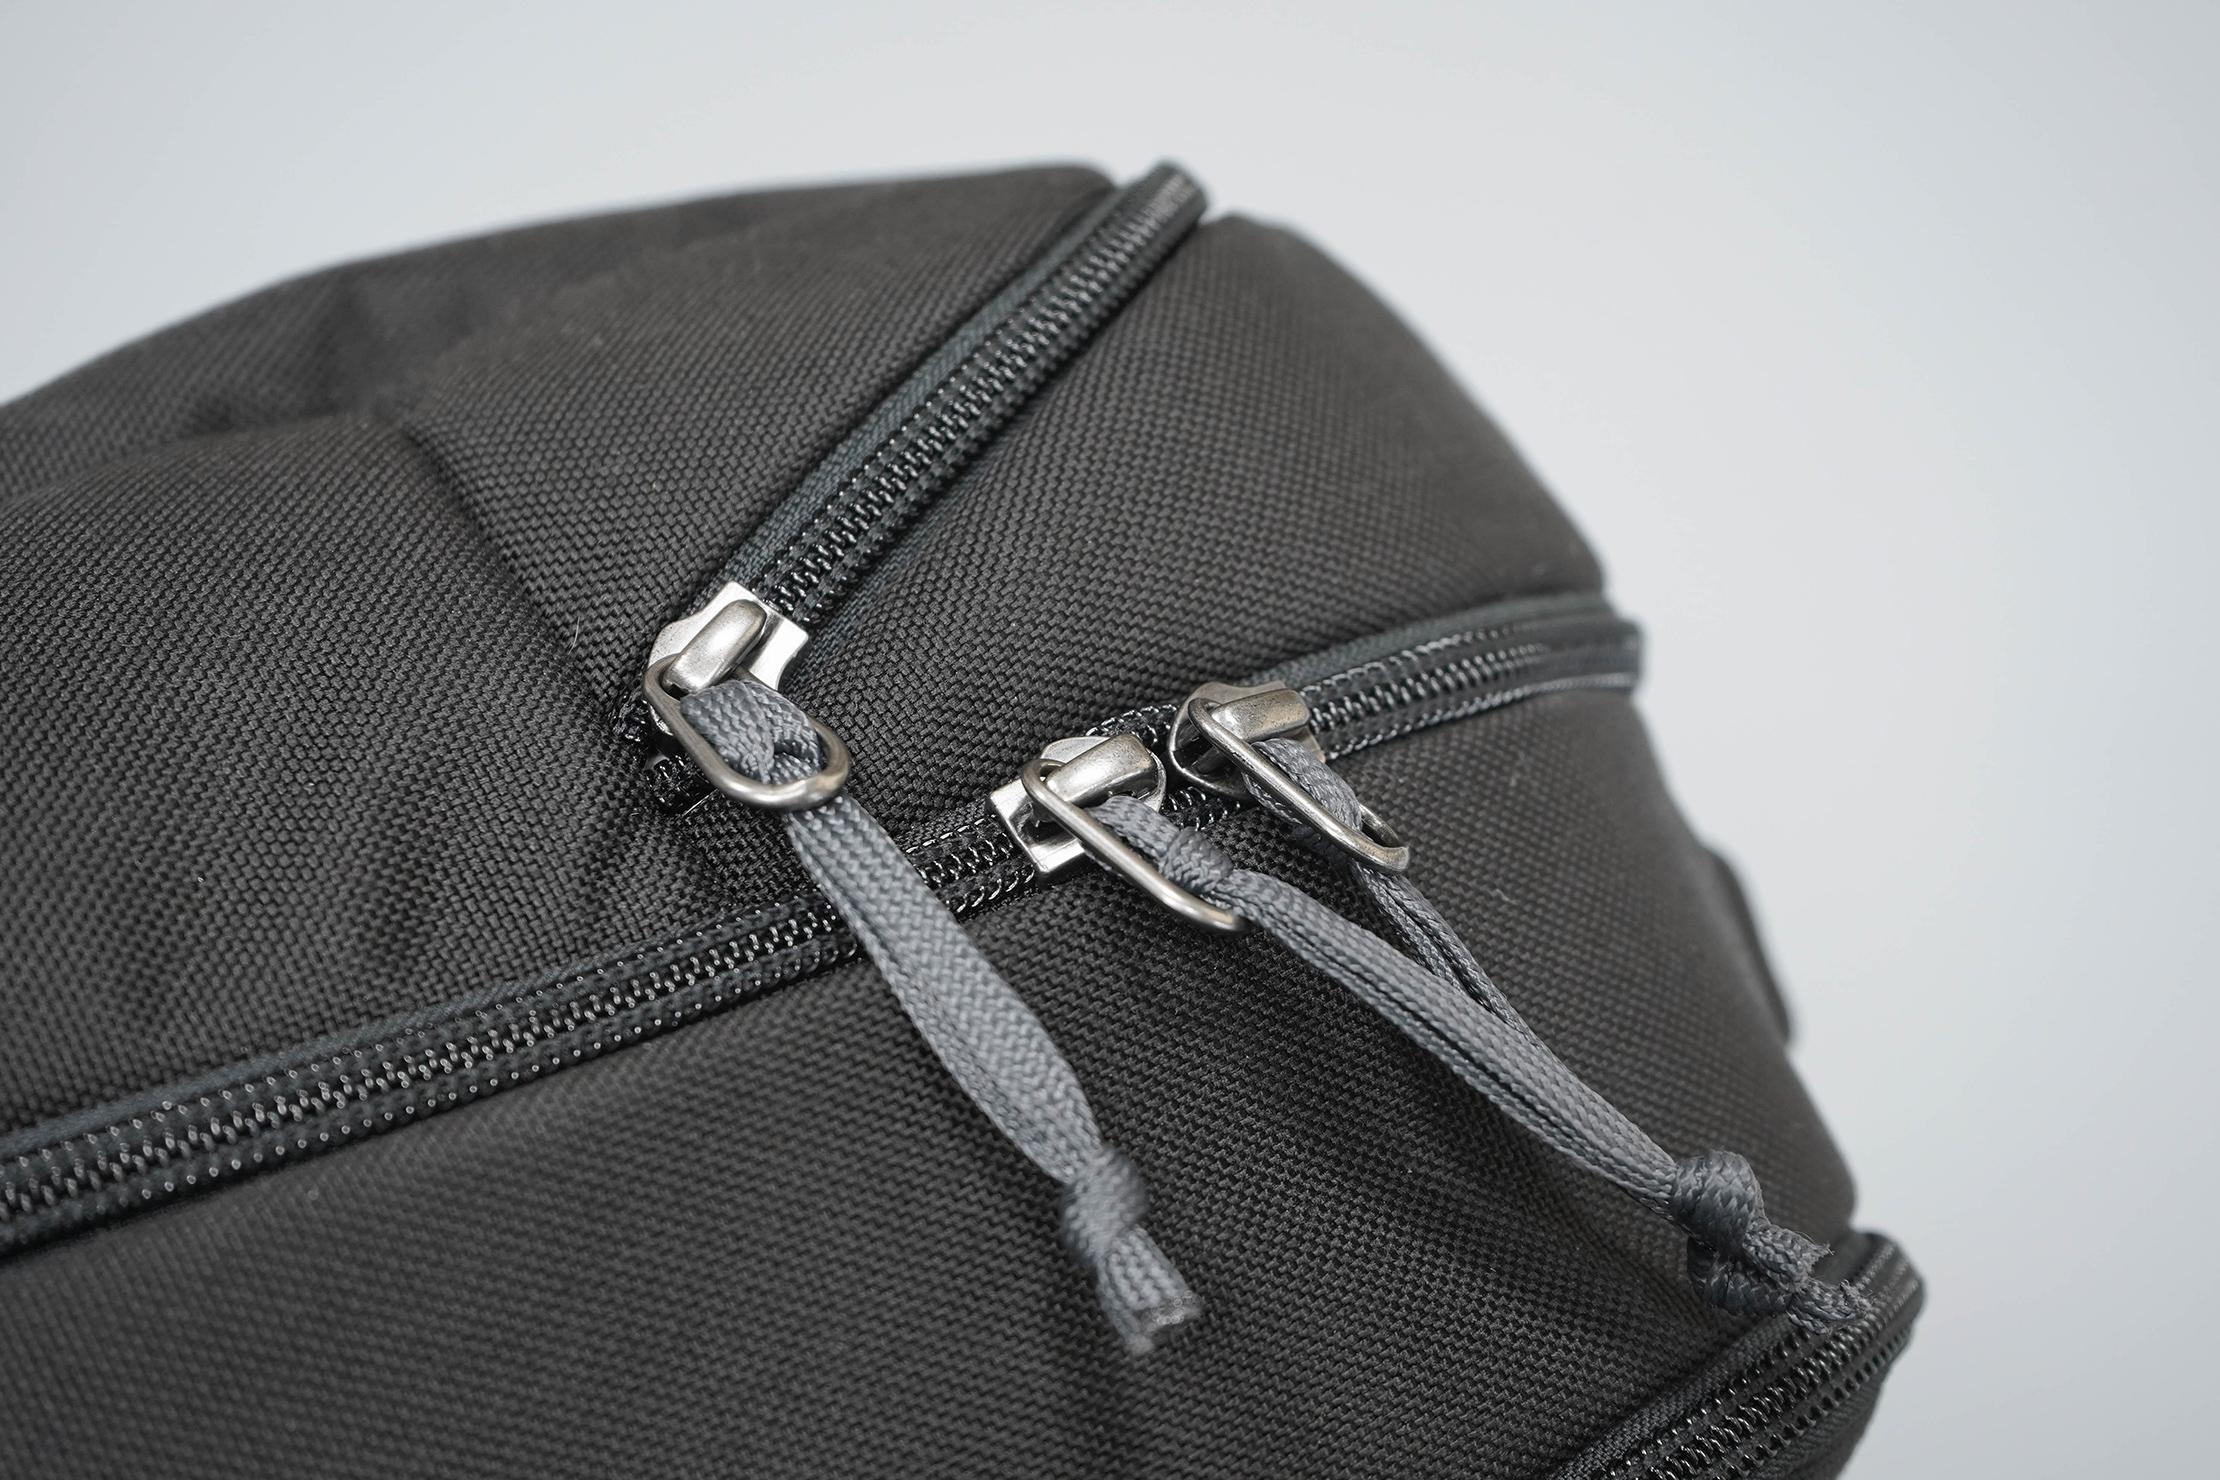 YETI Crossroads Backpack 23 Zippers